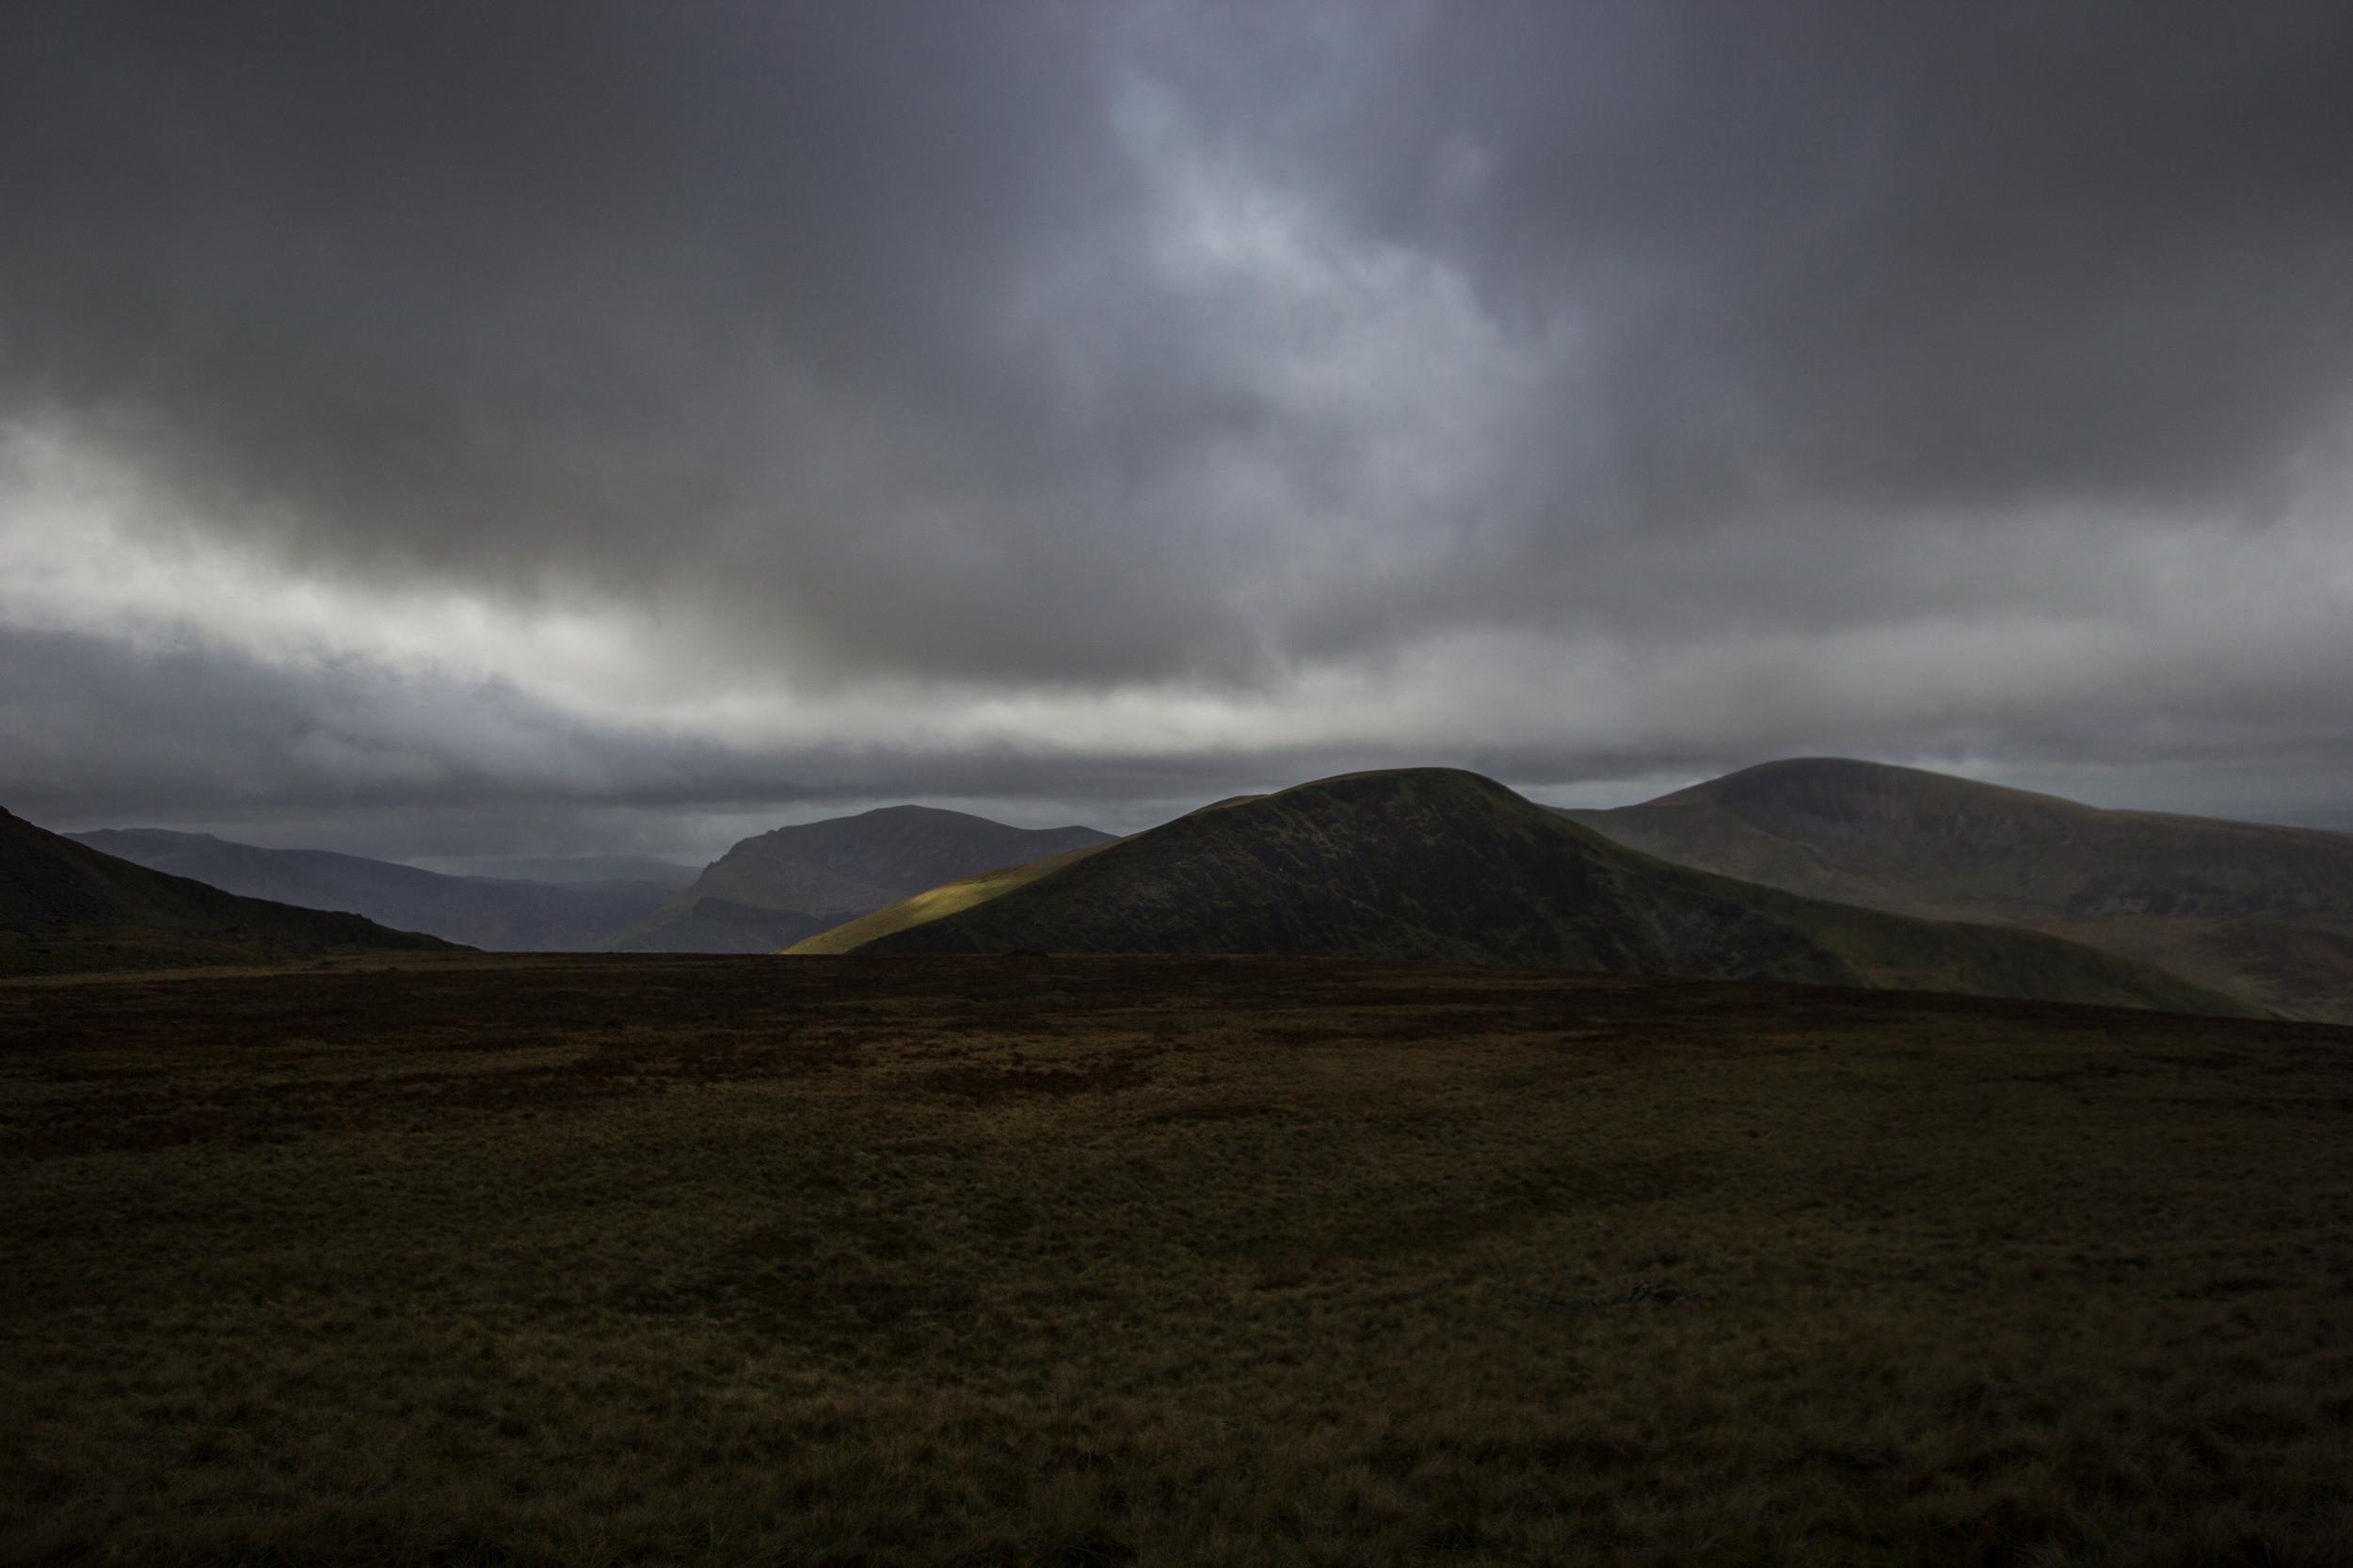 Mount Snowdonia